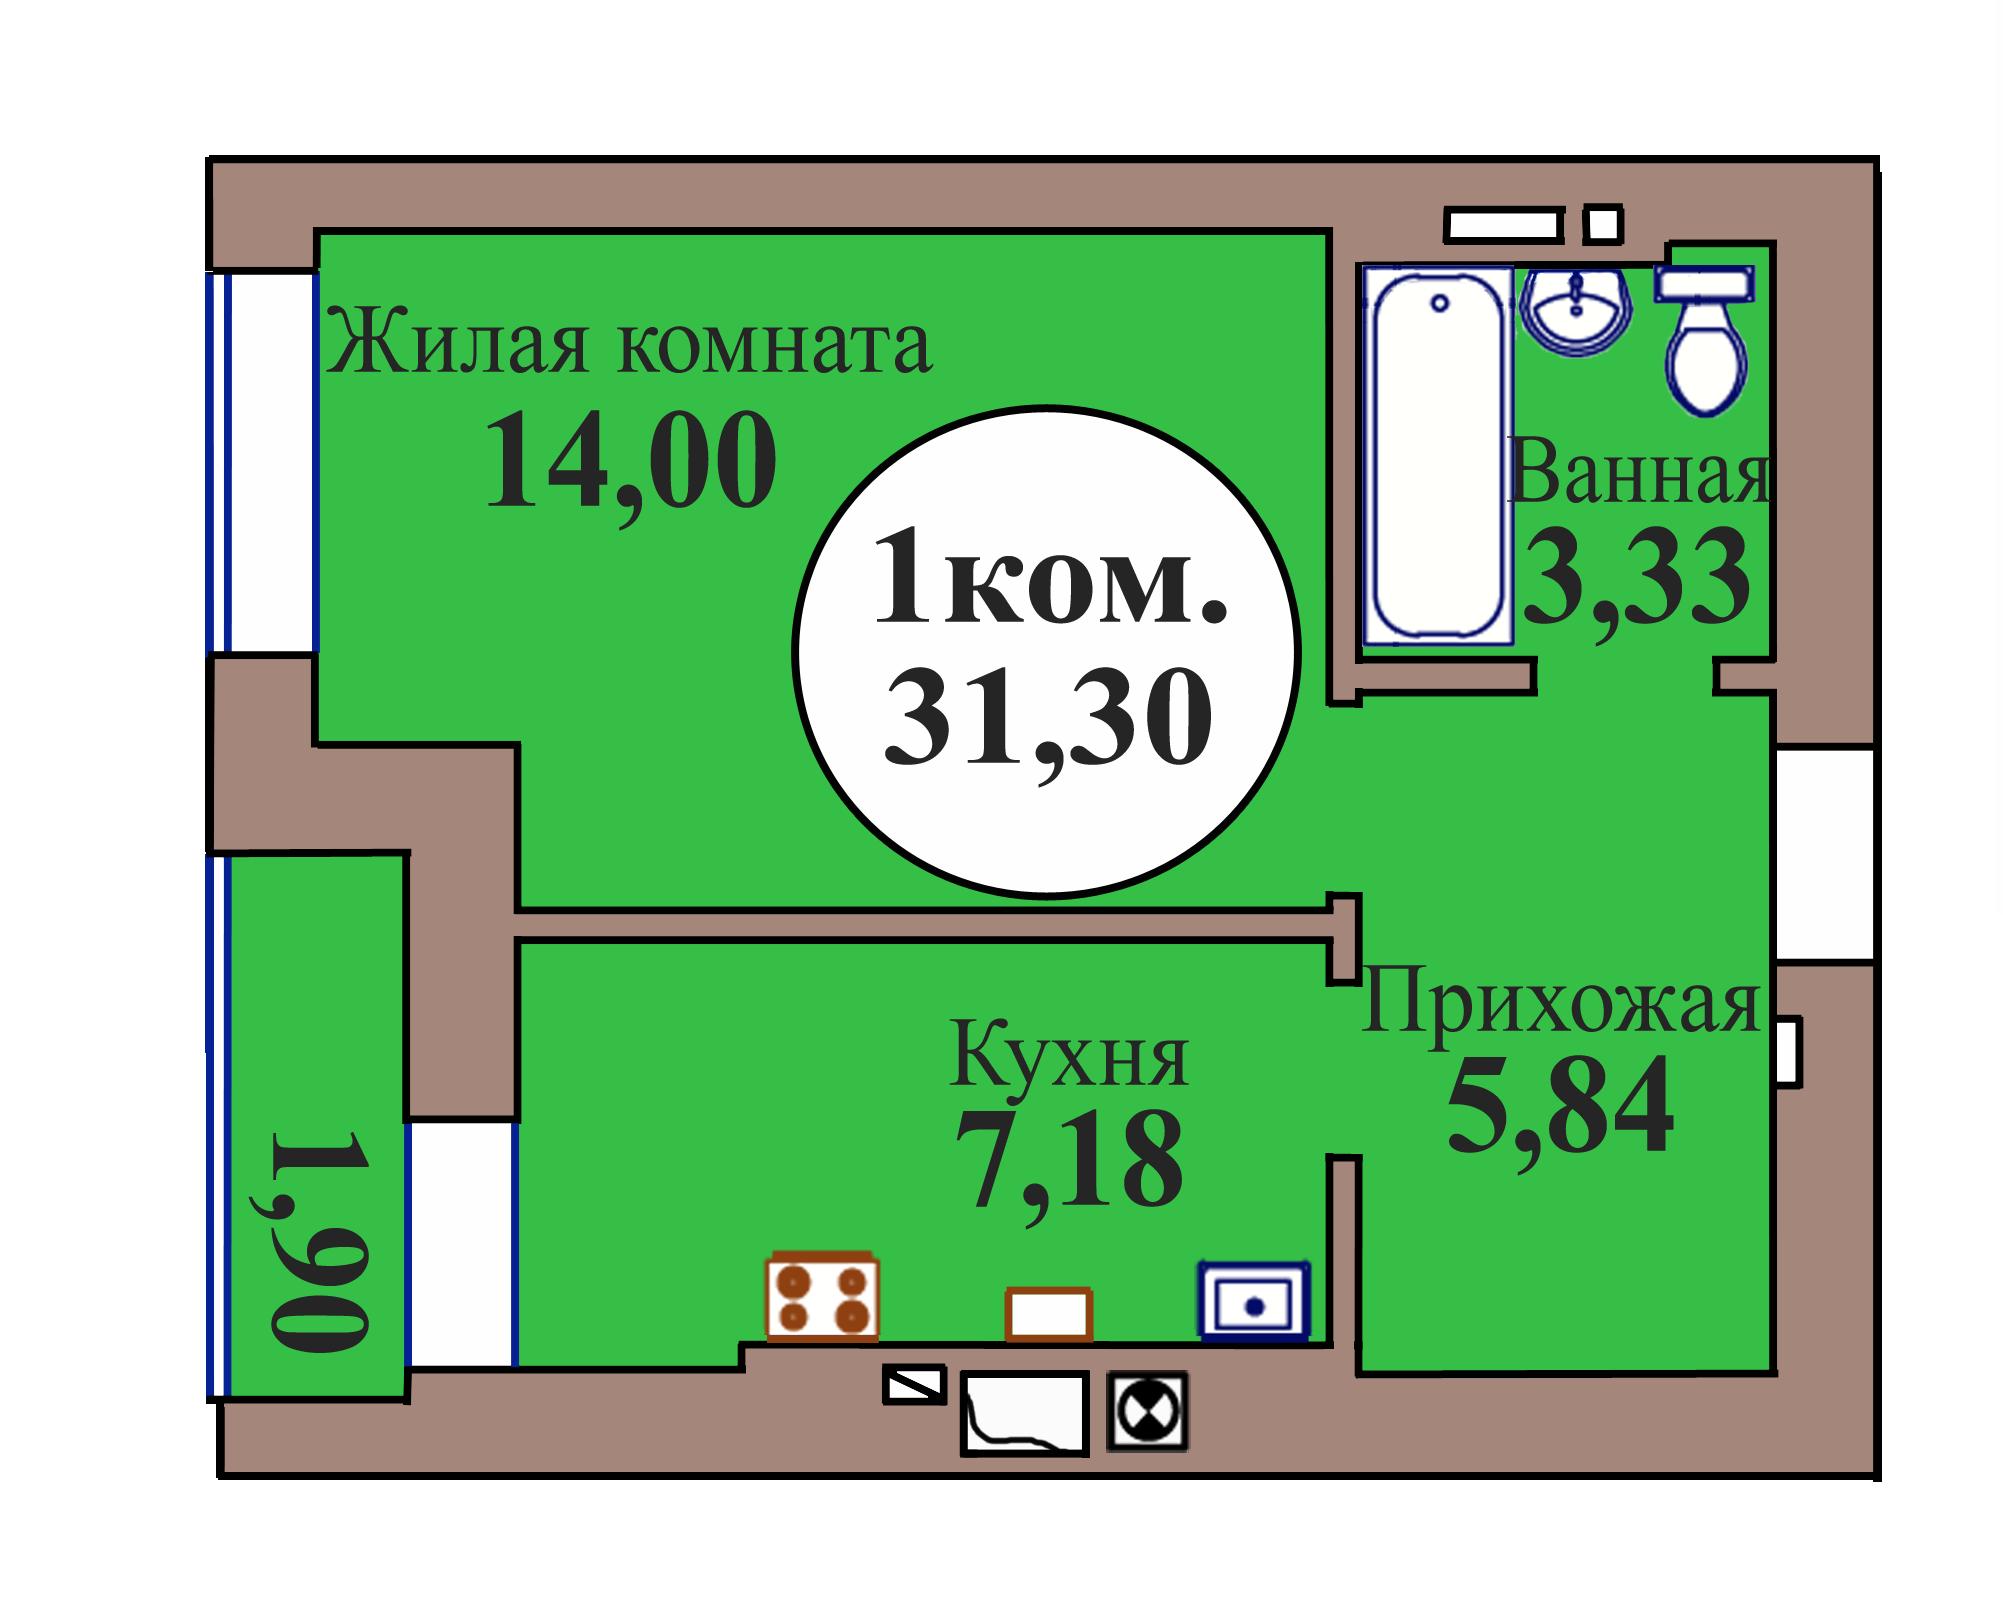 1-комн. кв. по пер. Калининградский, 5 кв. 43 в Калининграде